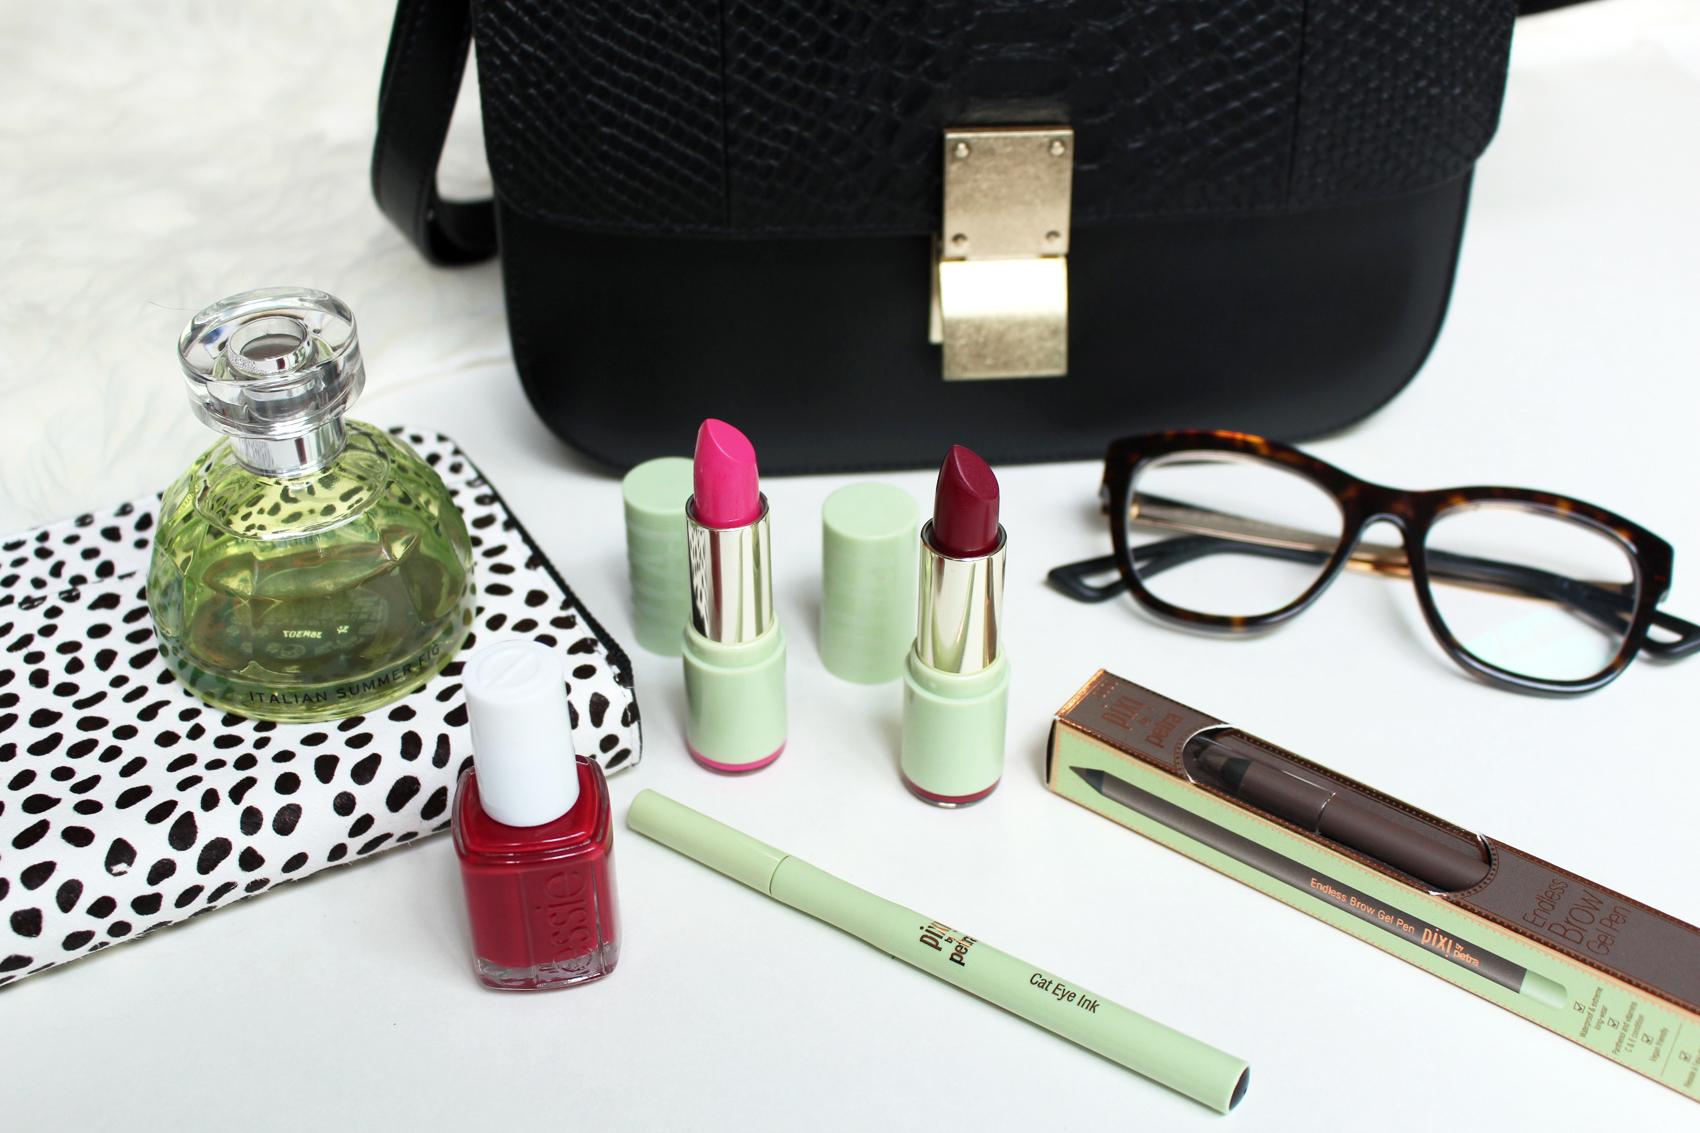 WoahStyle.com_Bag Spill_Whats In My Bag_JCOS STUDIOS box bag_Celine dupe_TheBodyShop Italian Summer Fig perfum_StatusAnxietyWallet_Pixi Beauty Fall2015_Essie red nail polish_FishnetStockings_Dior_eyewear_BeautyPost_Accessories_handbag_purse_1734.jpg